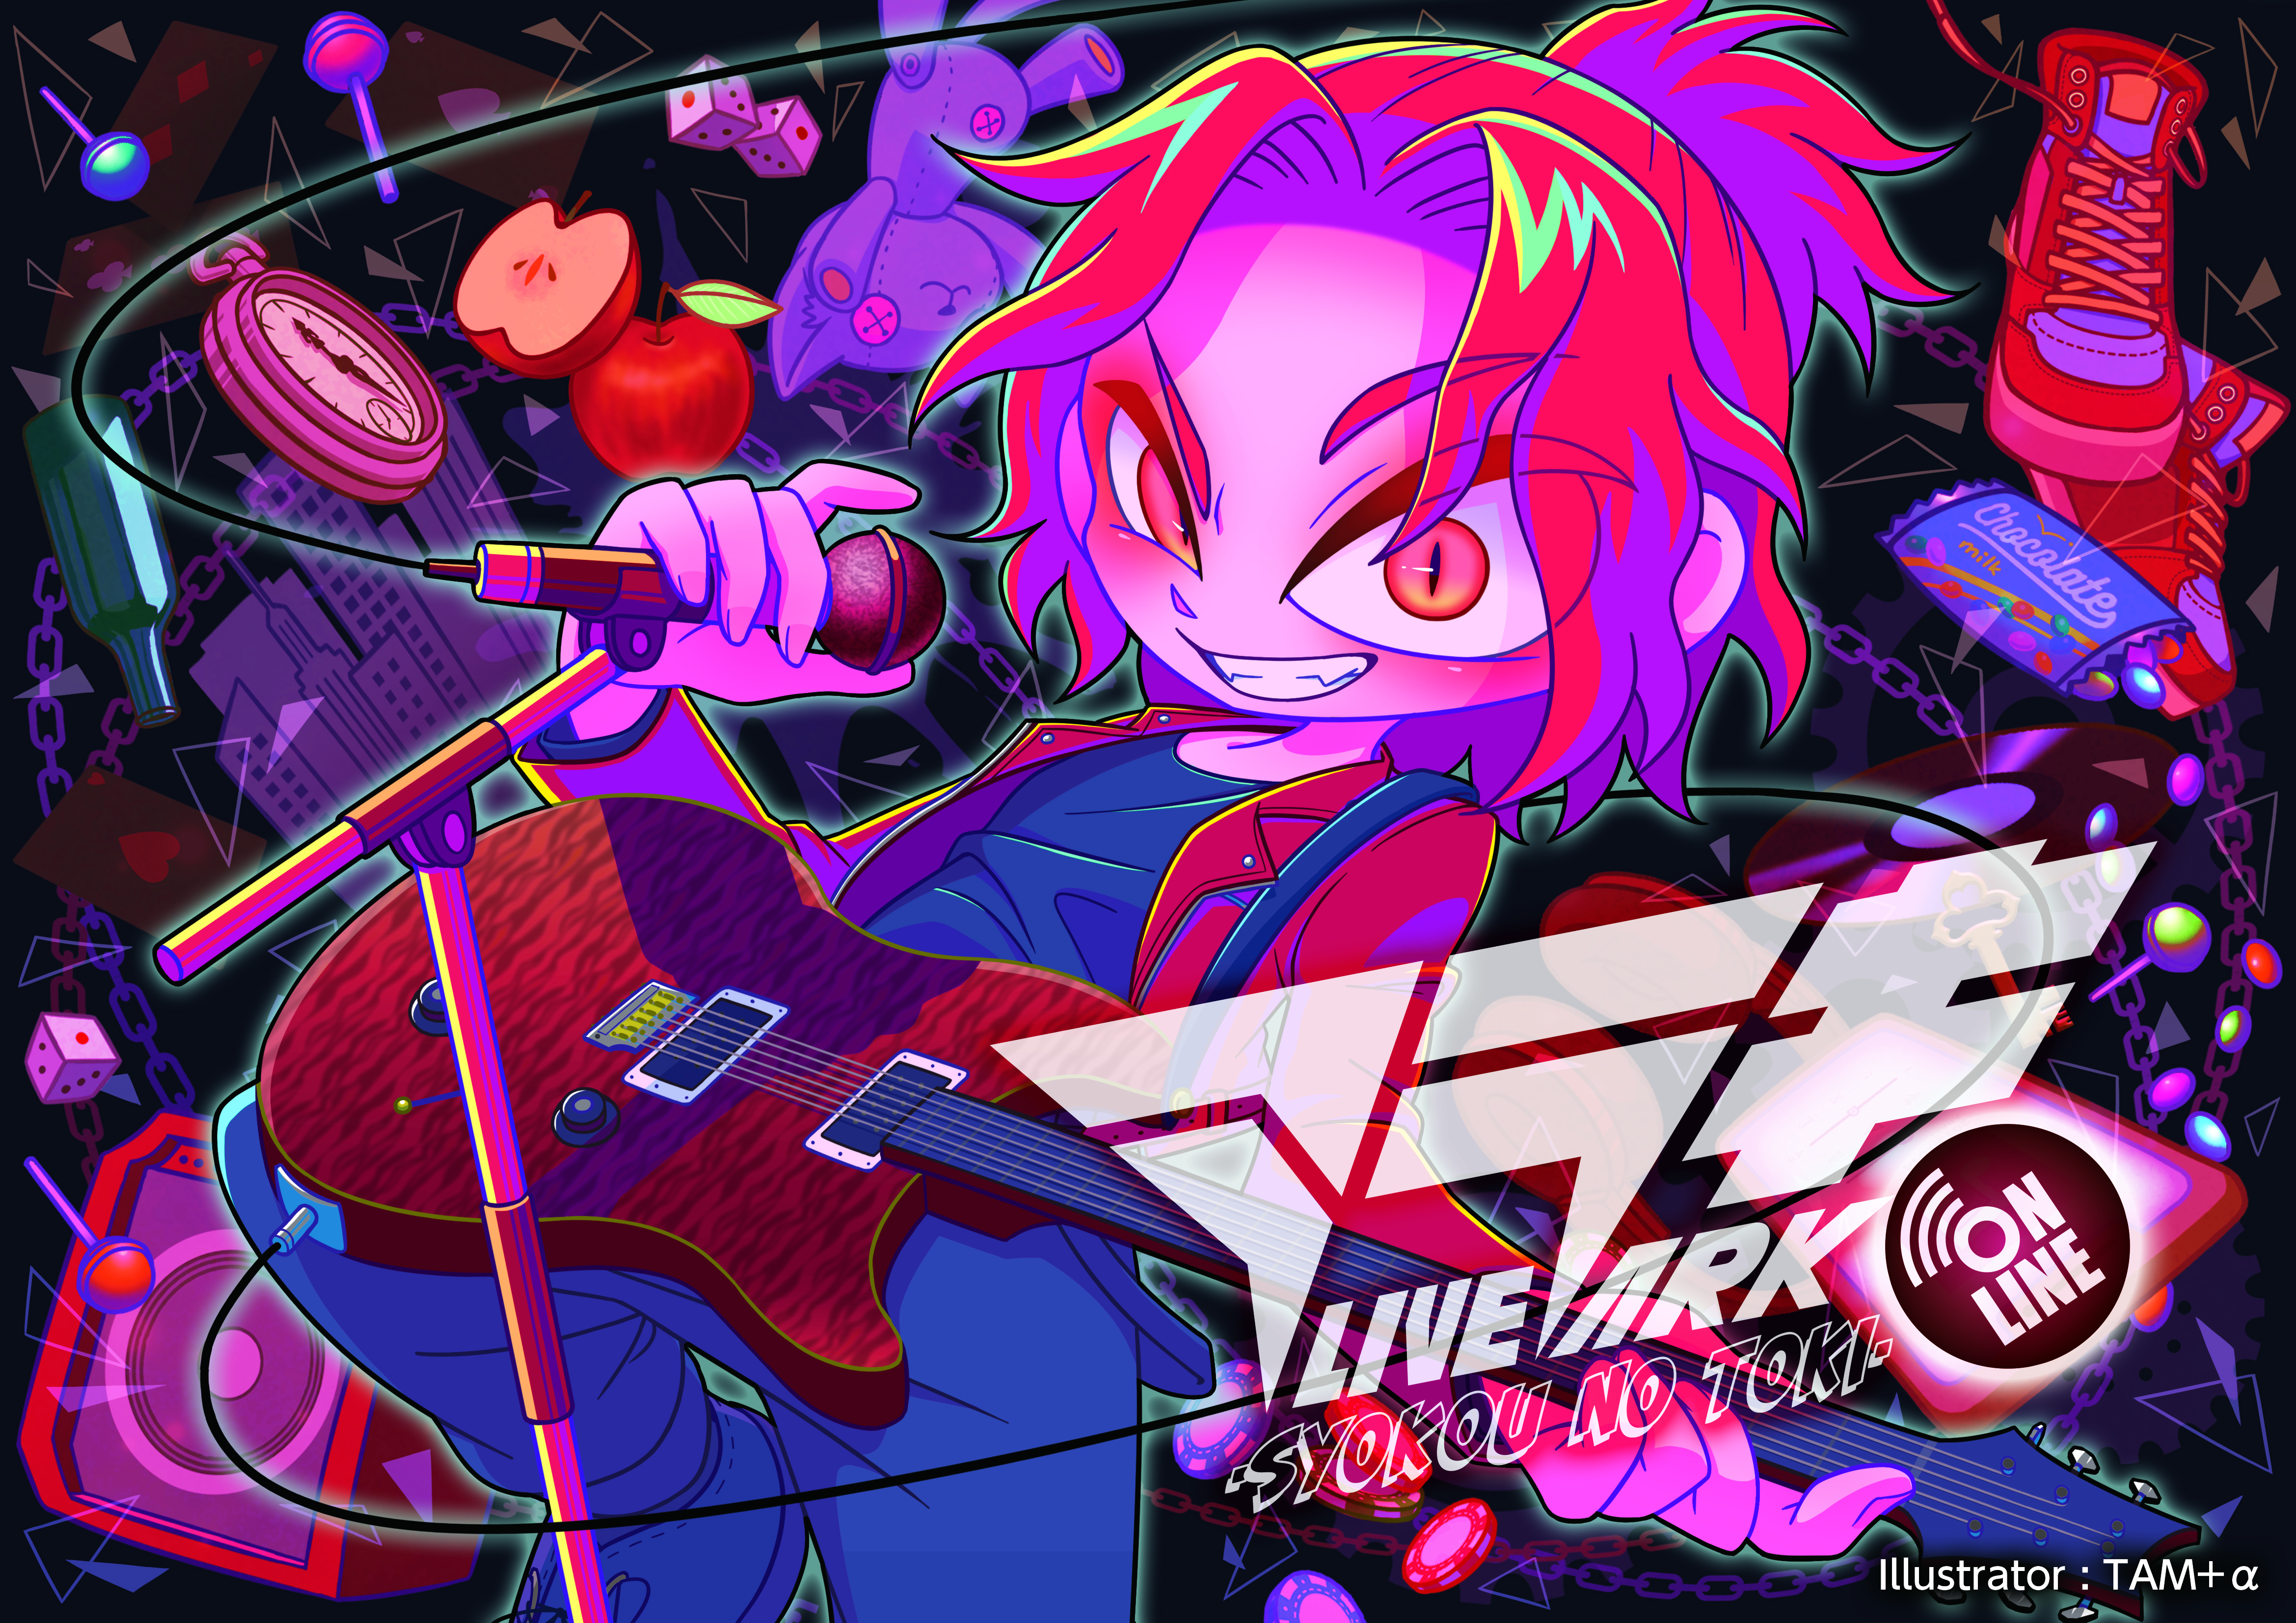 【ARAKI LIVE ARK -syokou no toki-】Clear multi-case No.2